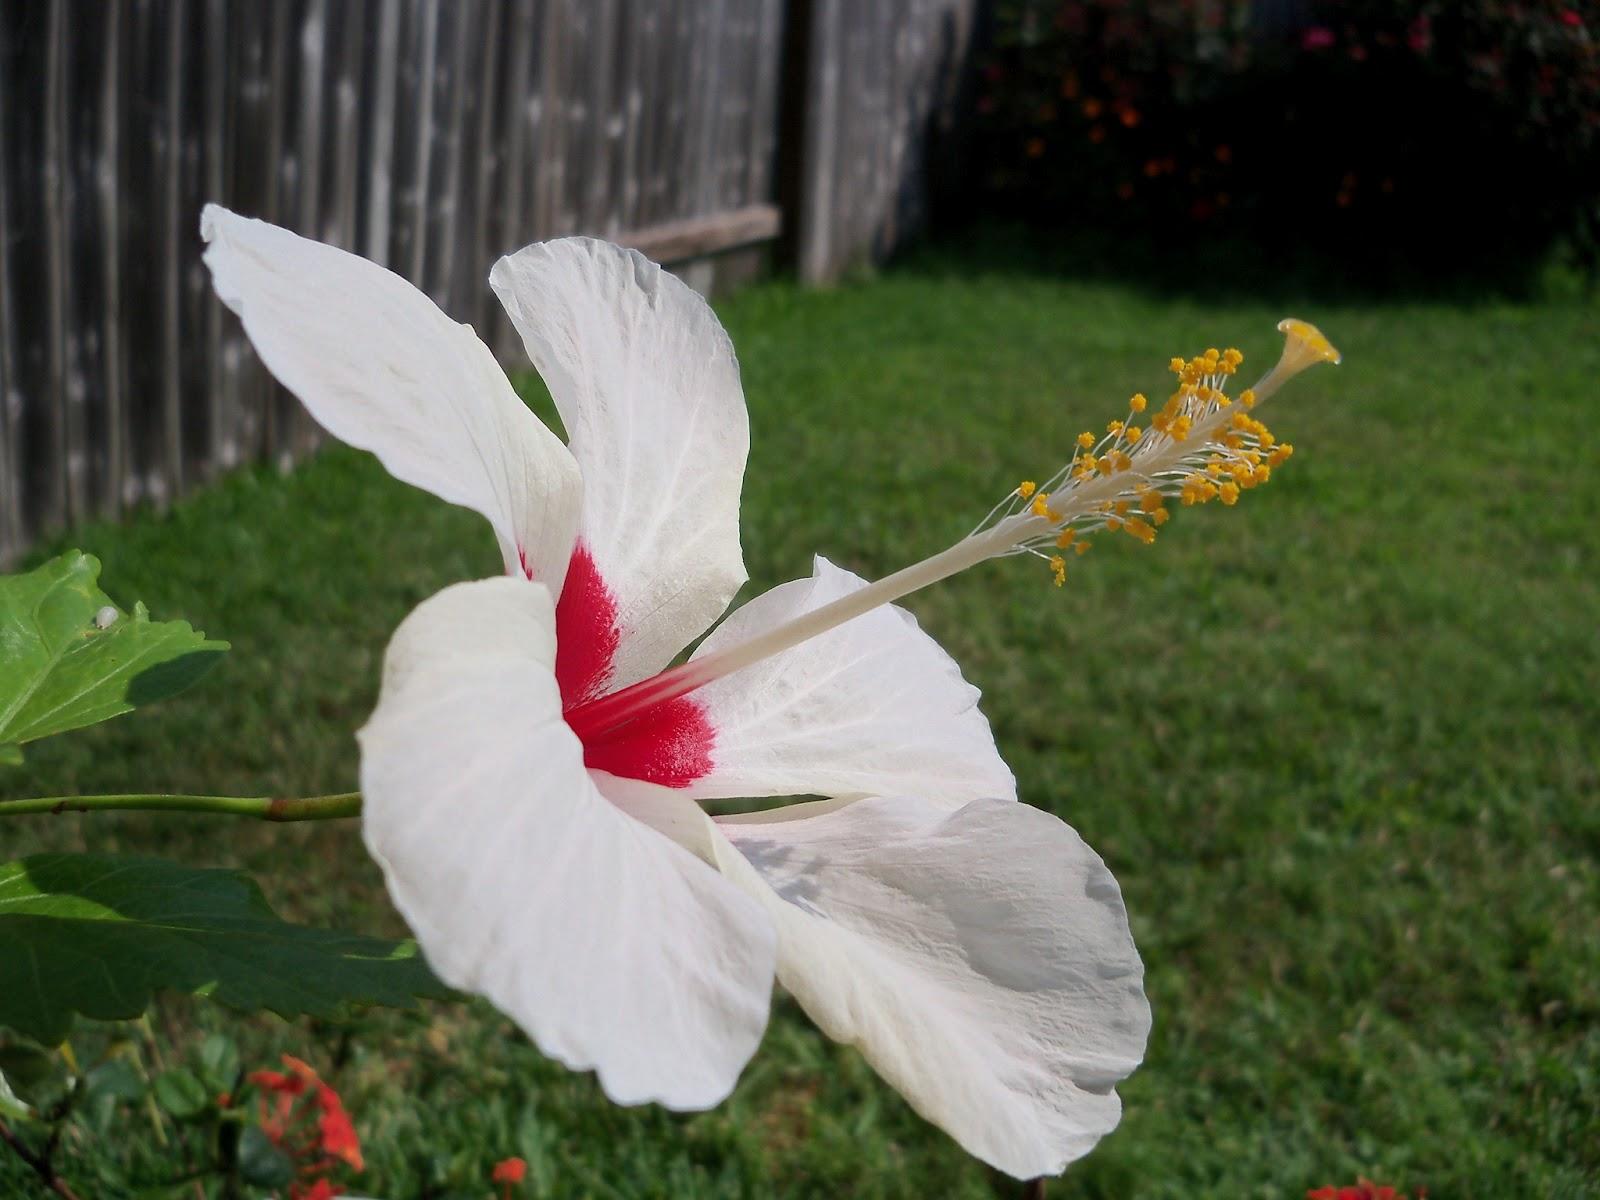 Gardening 2012 - 115_1911.JPG